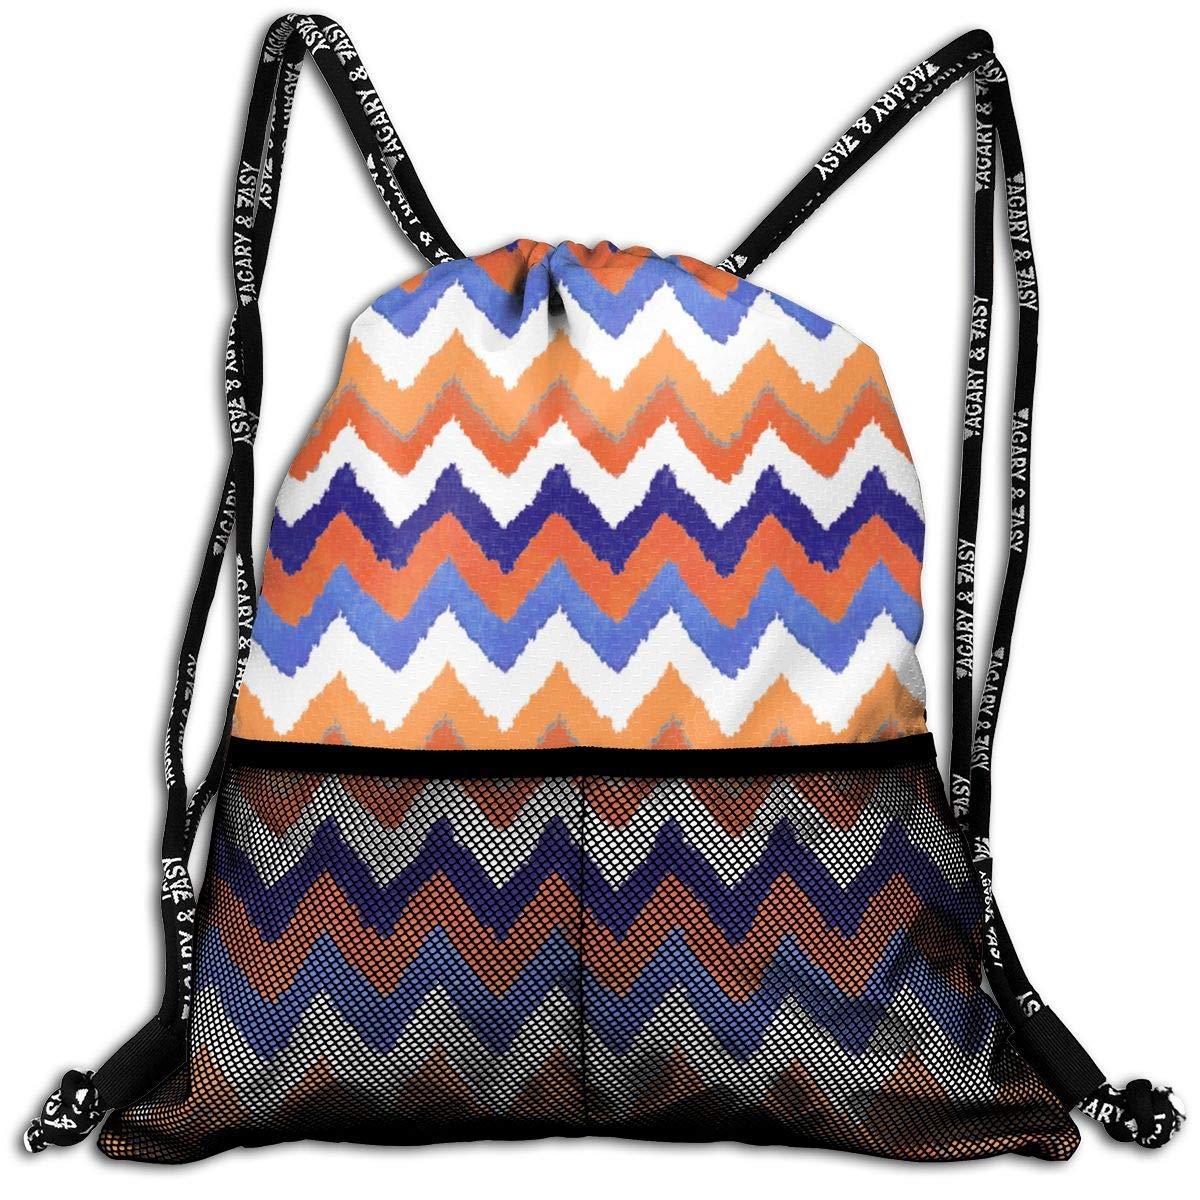 Watercolor Chevron Stripe Color Durable Sport Drawstring Backpack for School Soccer Yoga